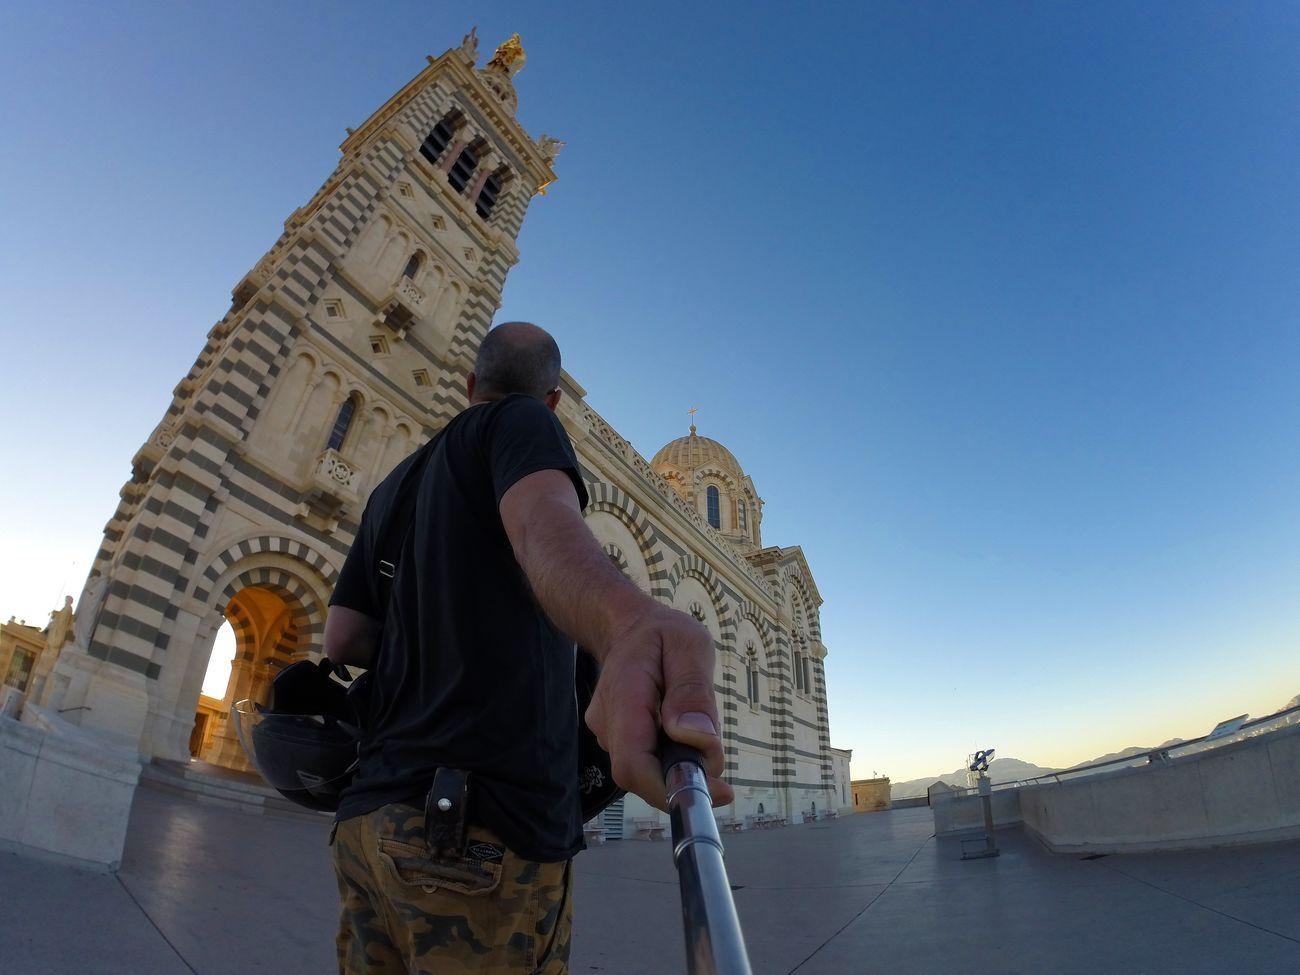 The rooftop GoPrography Goproblackedition Gopro Marseillecartepostale📮 Goprooftheday Marseille Praying GoPro Hero3+ Gopromoment Gopro Shots Goprolifestyle_